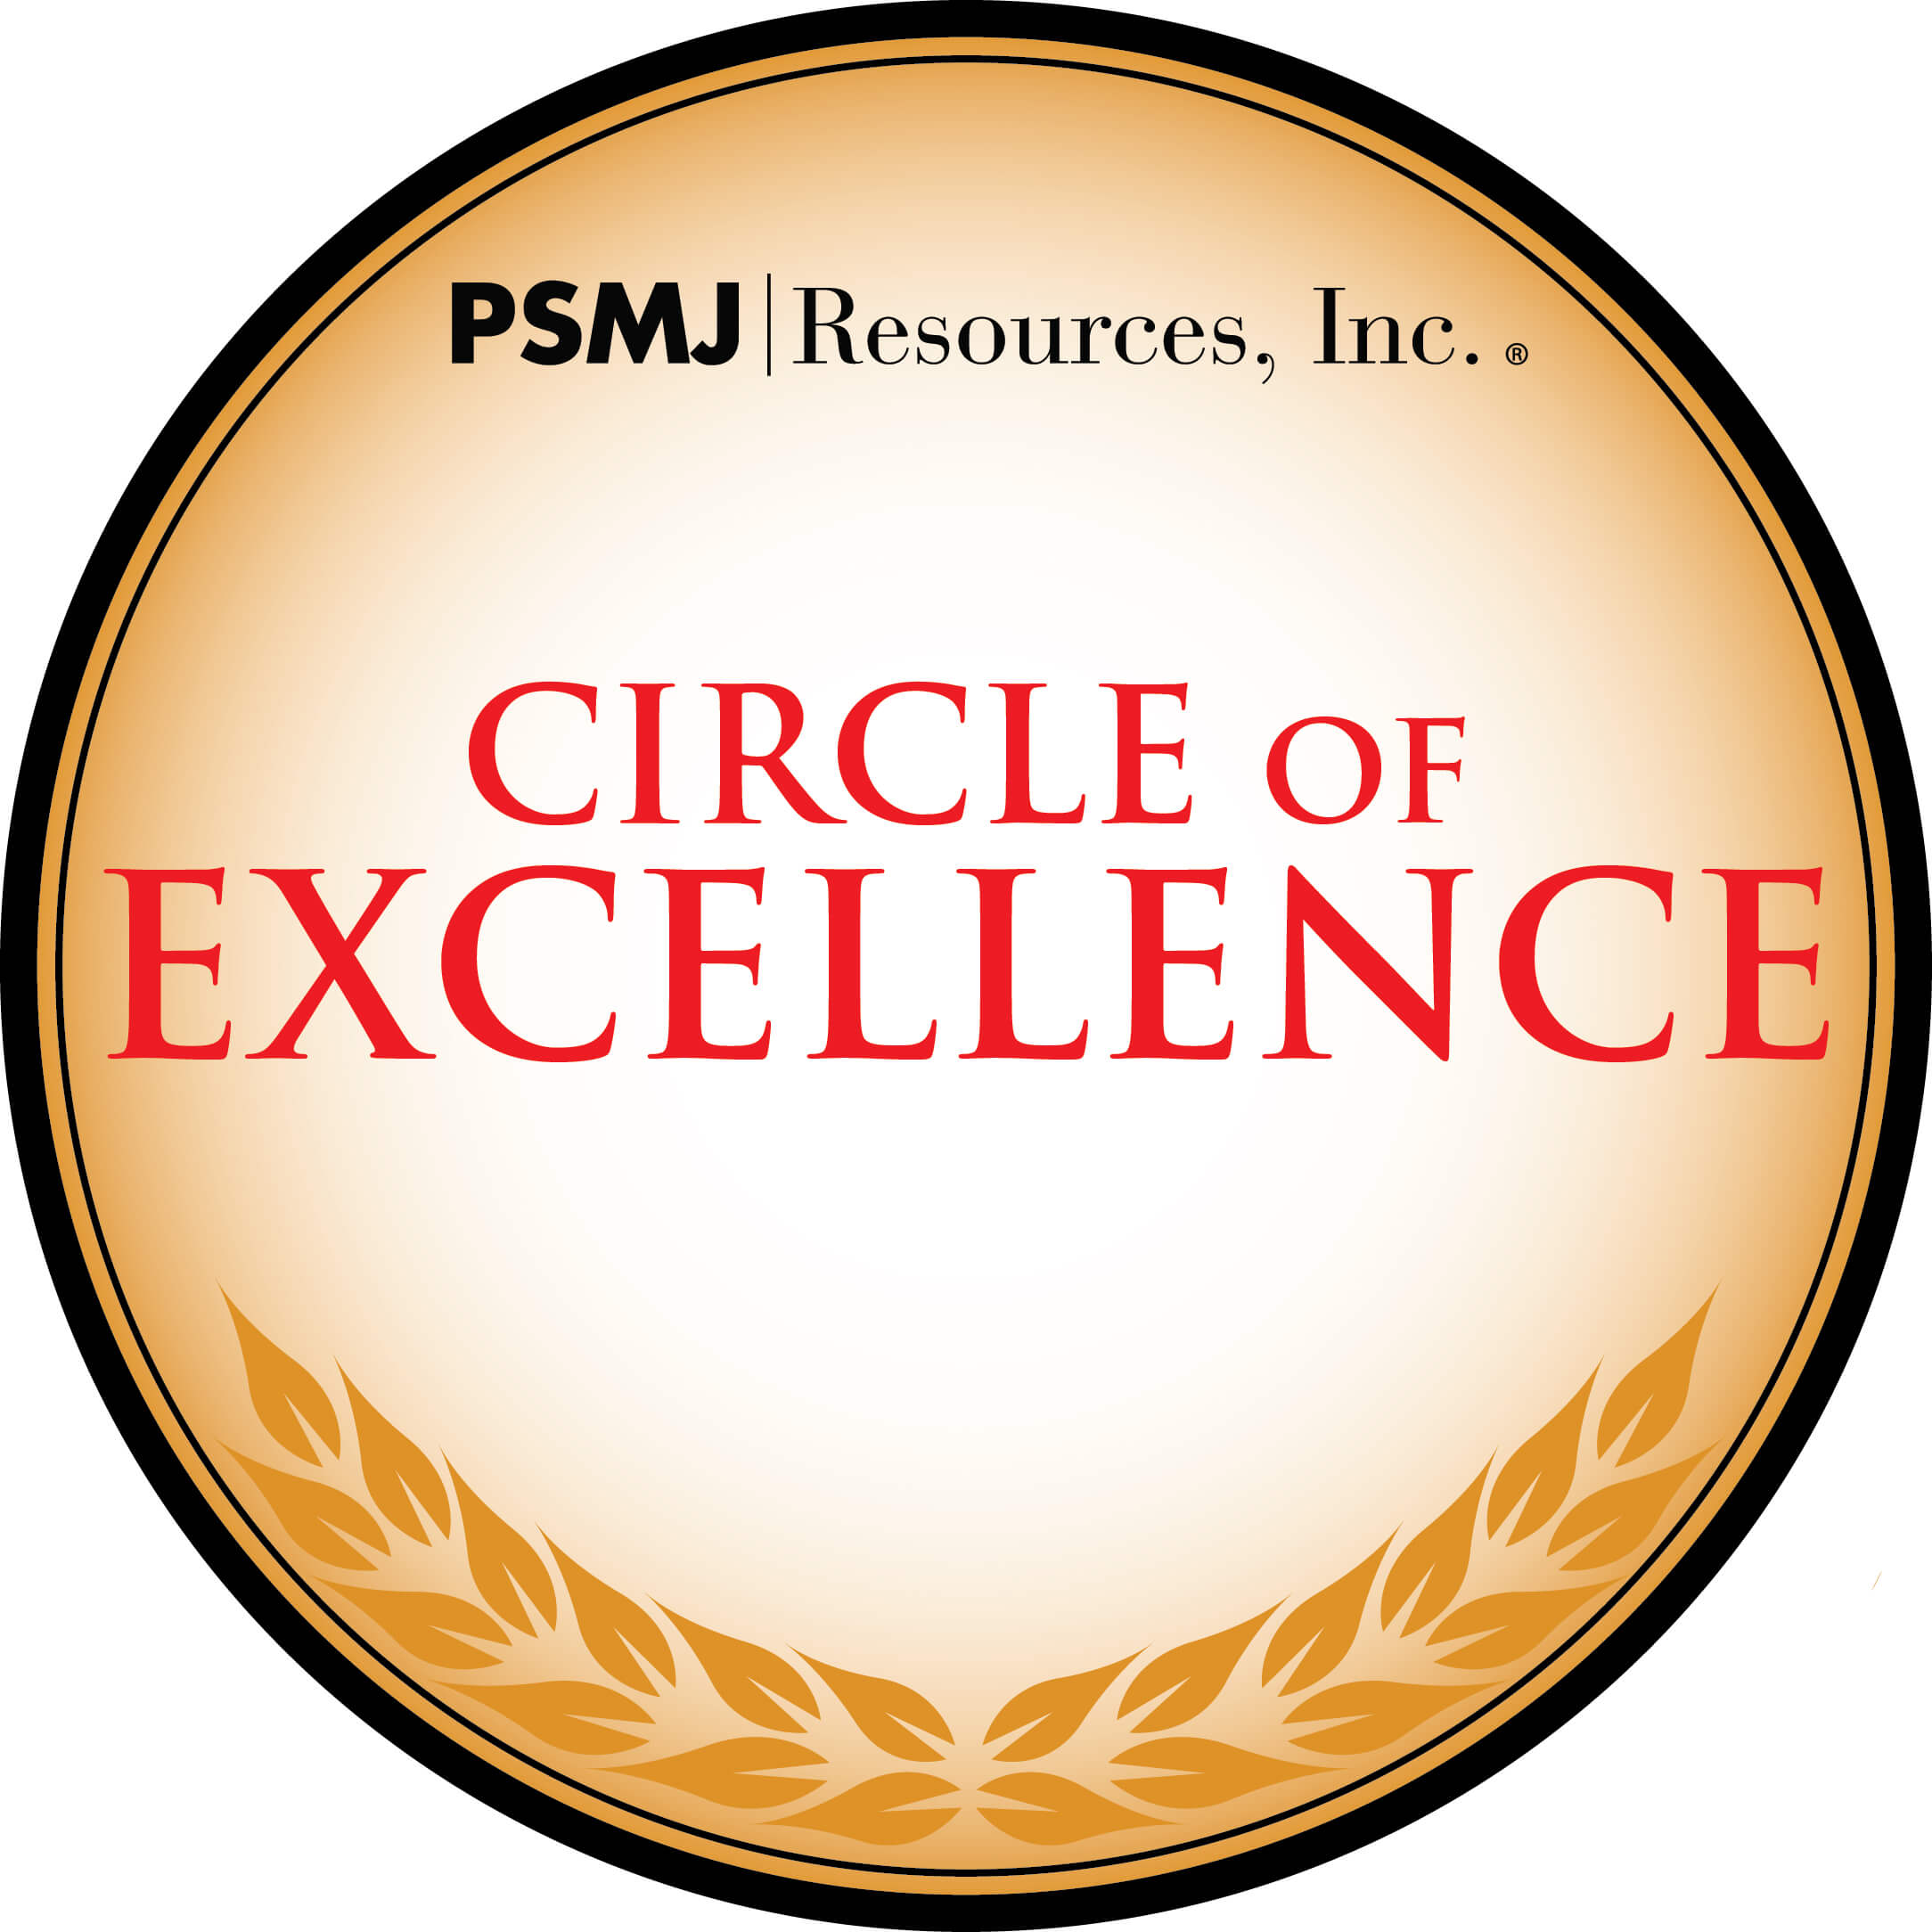 PSMJ's Circle of Excellence Award